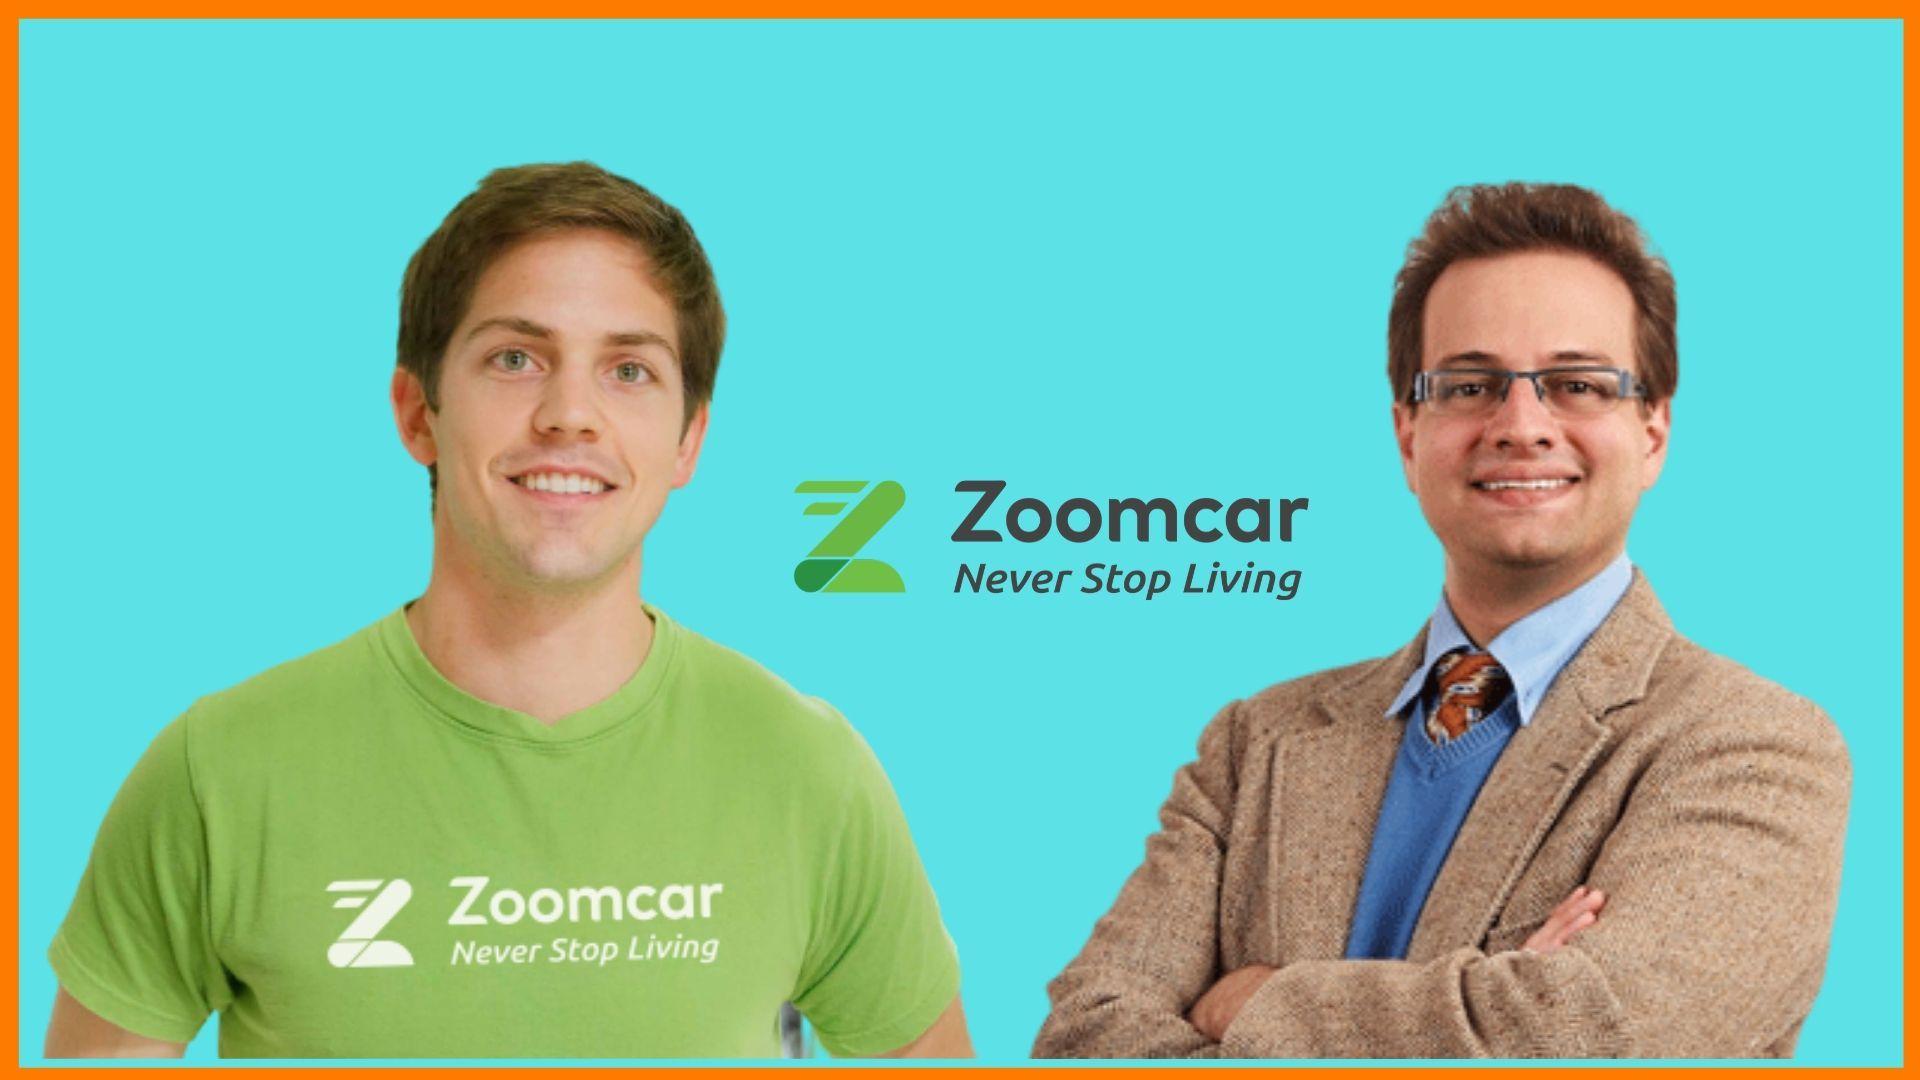 Greg Moran and David Back - Founders of Zoomcar